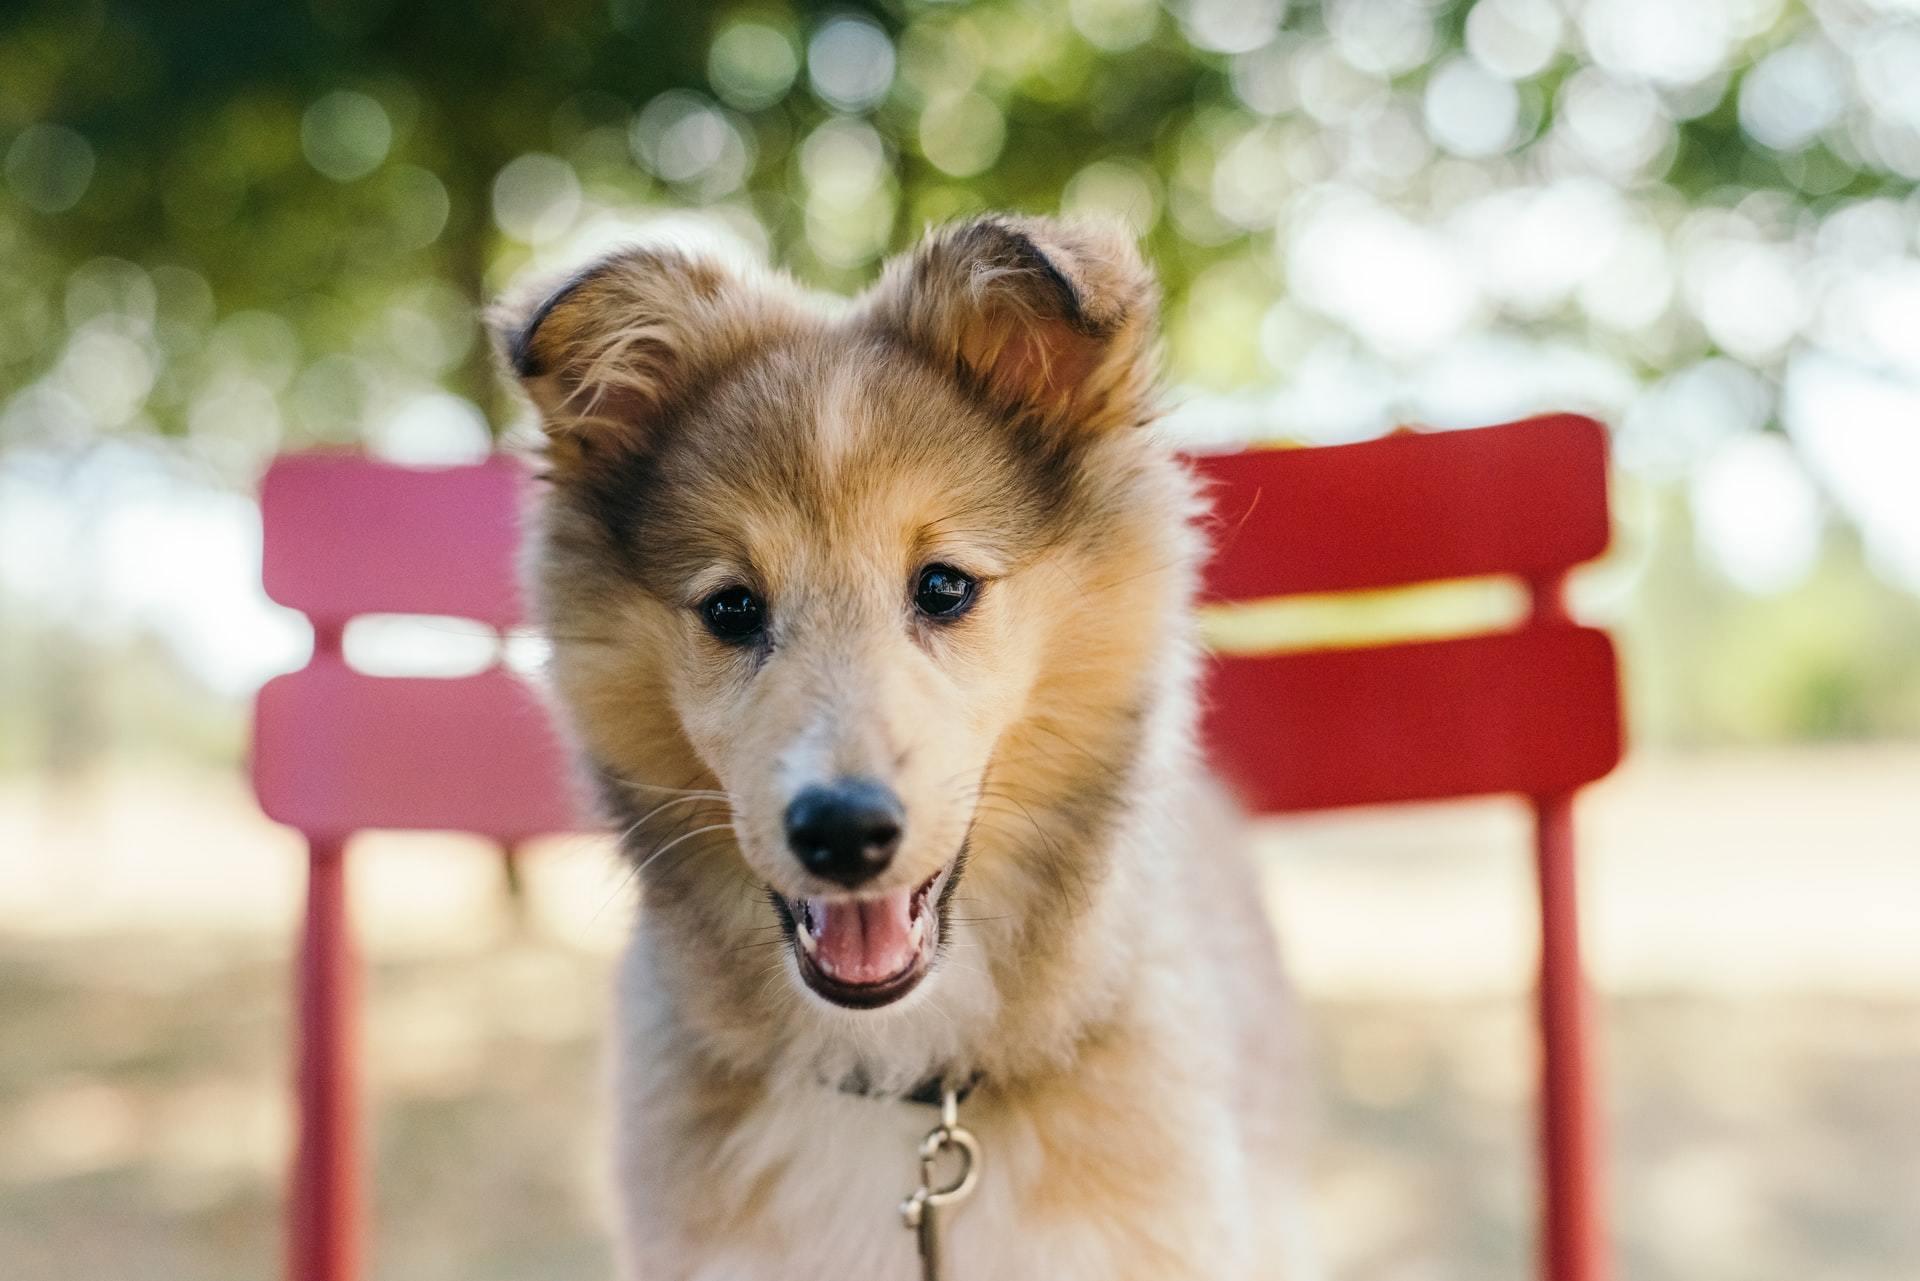 dog ear mite treatment